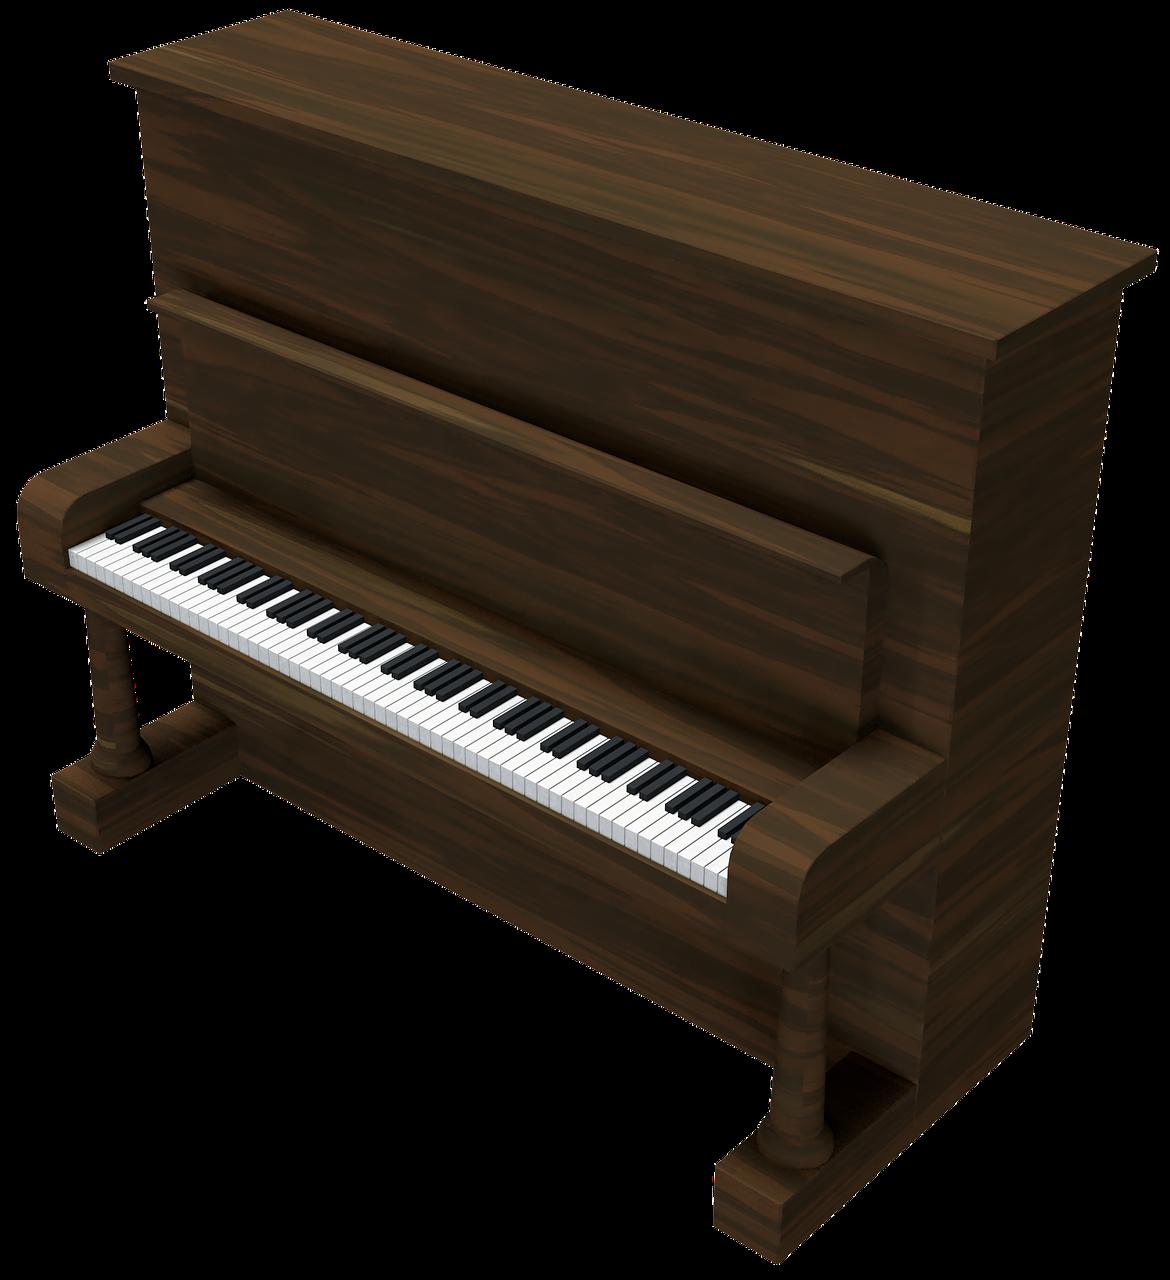 piano, musical instrument, instrument